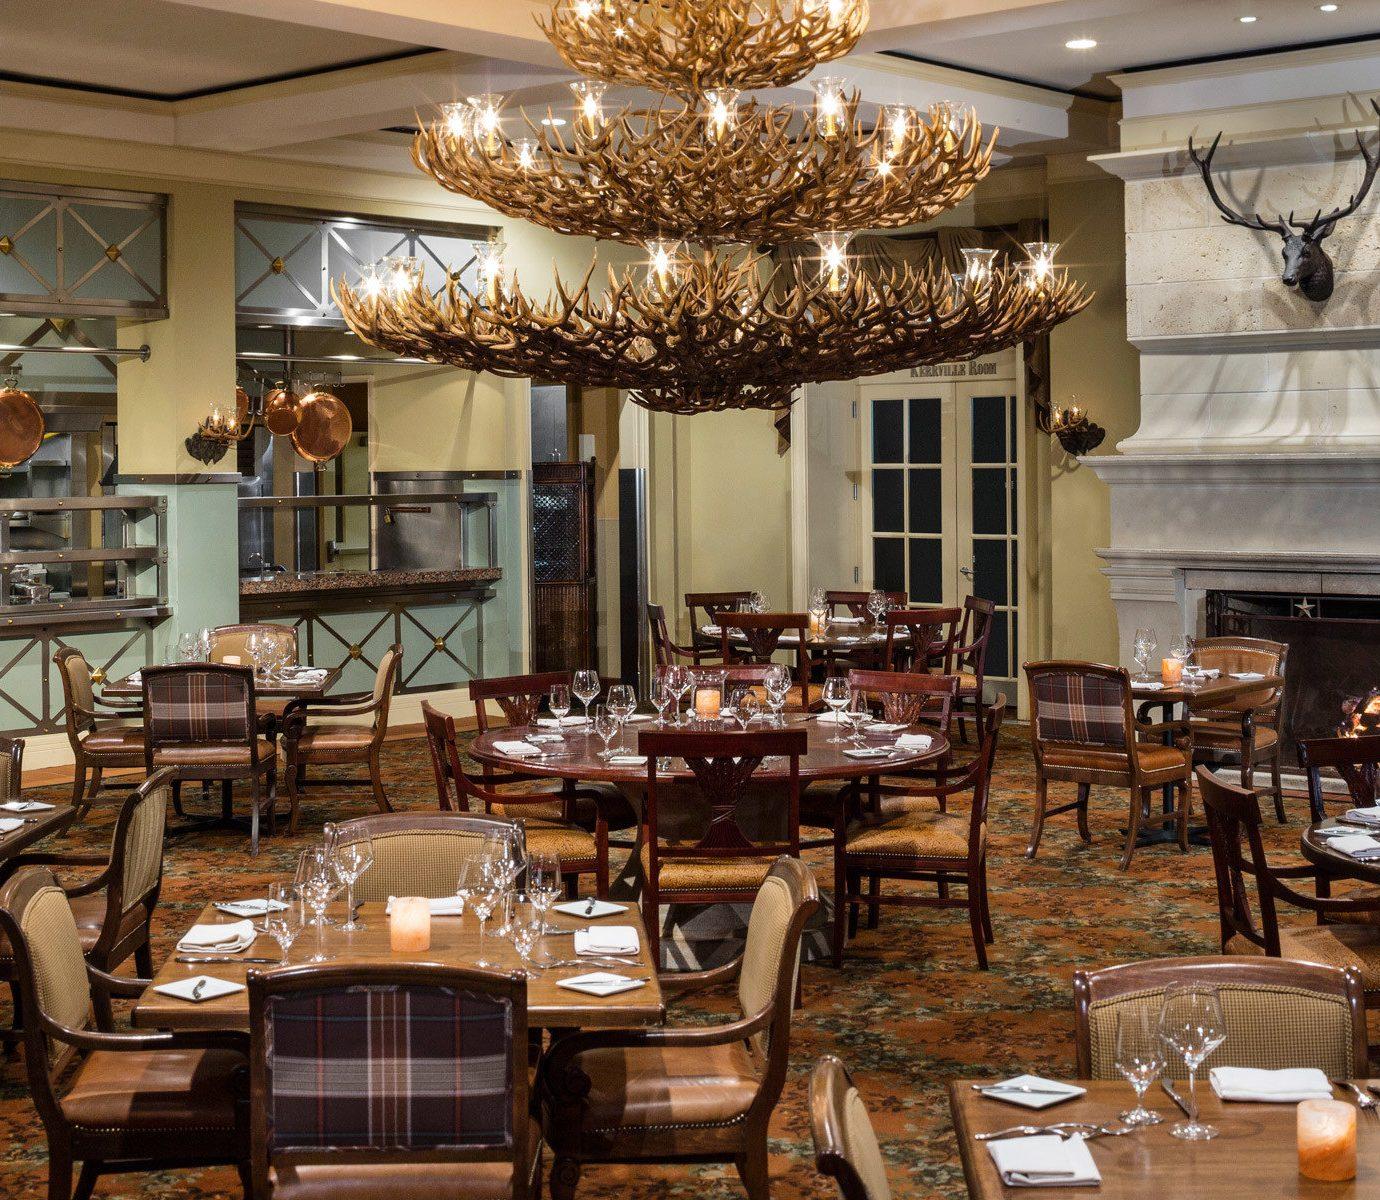 Dining Drink Eat Elegant Fireplace Ranch Resort chair restaurant function hall café Lobby brunch ballroom set cluttered